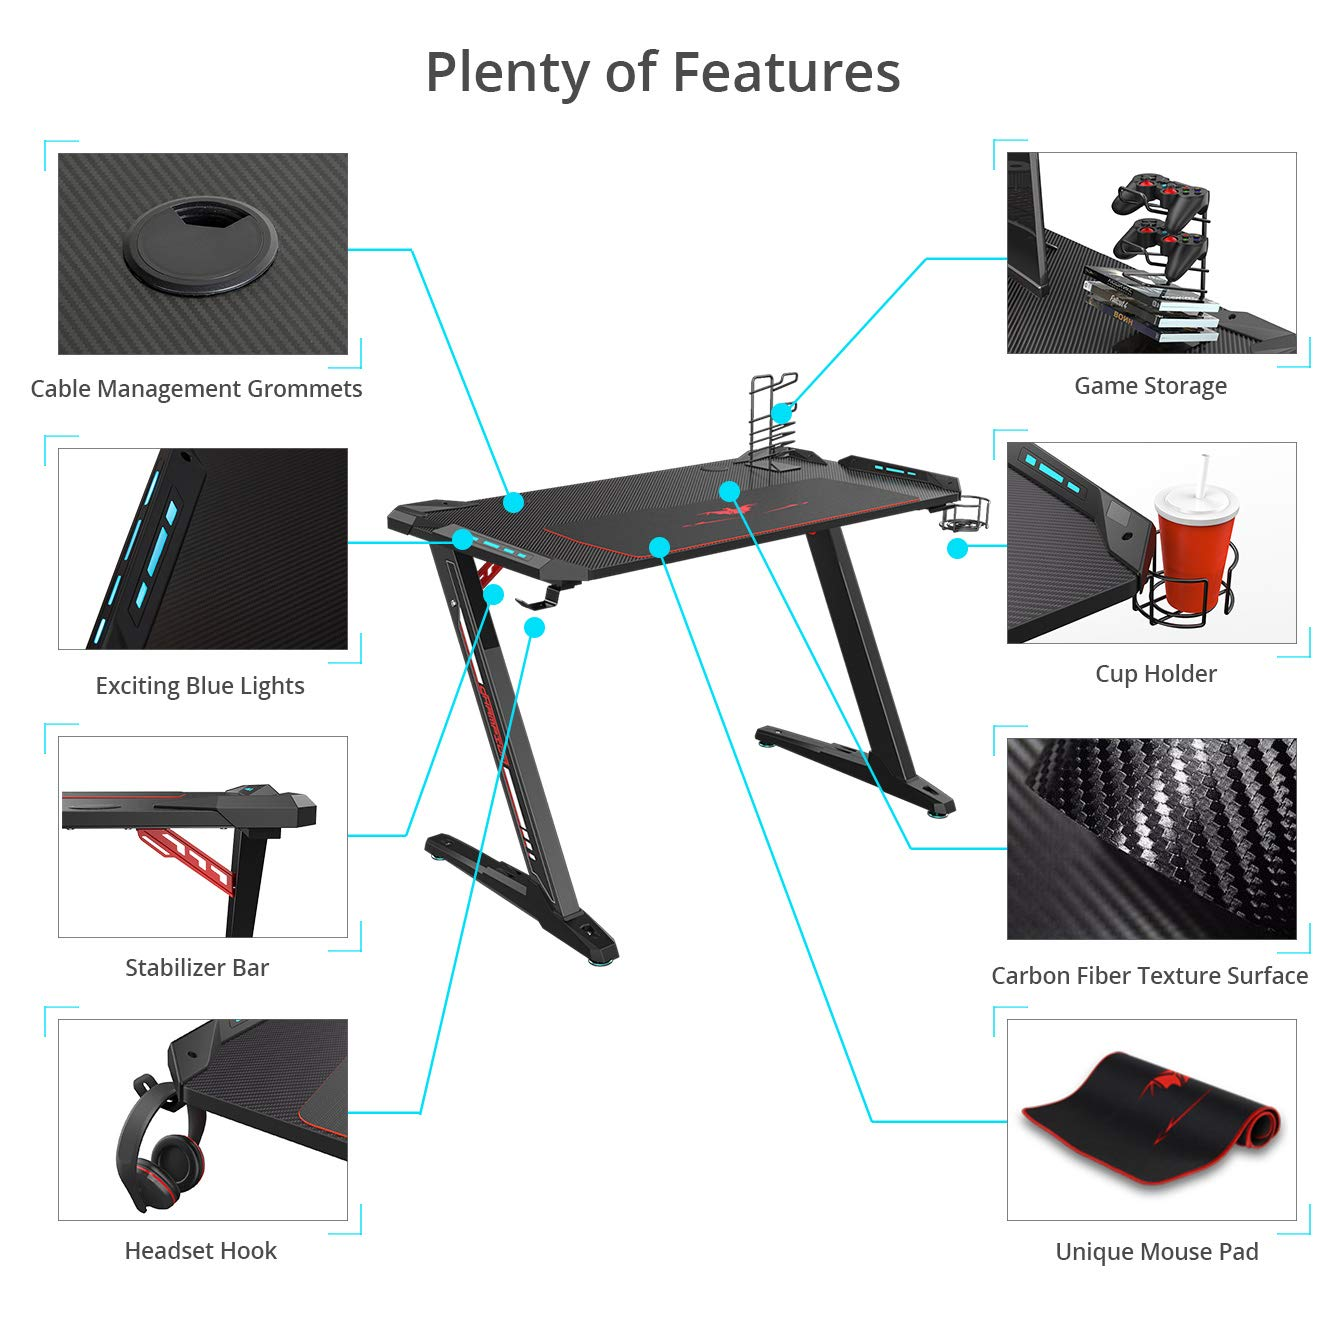 Eureka Ergonomic Z1-S Gaming Desk - Mesa de juegos para computadora, mesa de juegos, mesa de juegos para PC con luces LED, fibra de carbono, ...